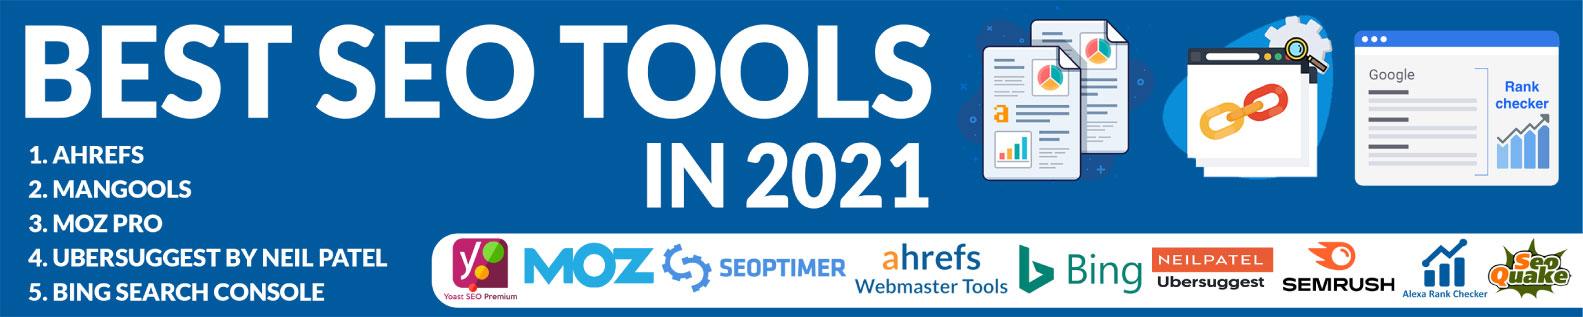 Bests SEO Tools in 2021